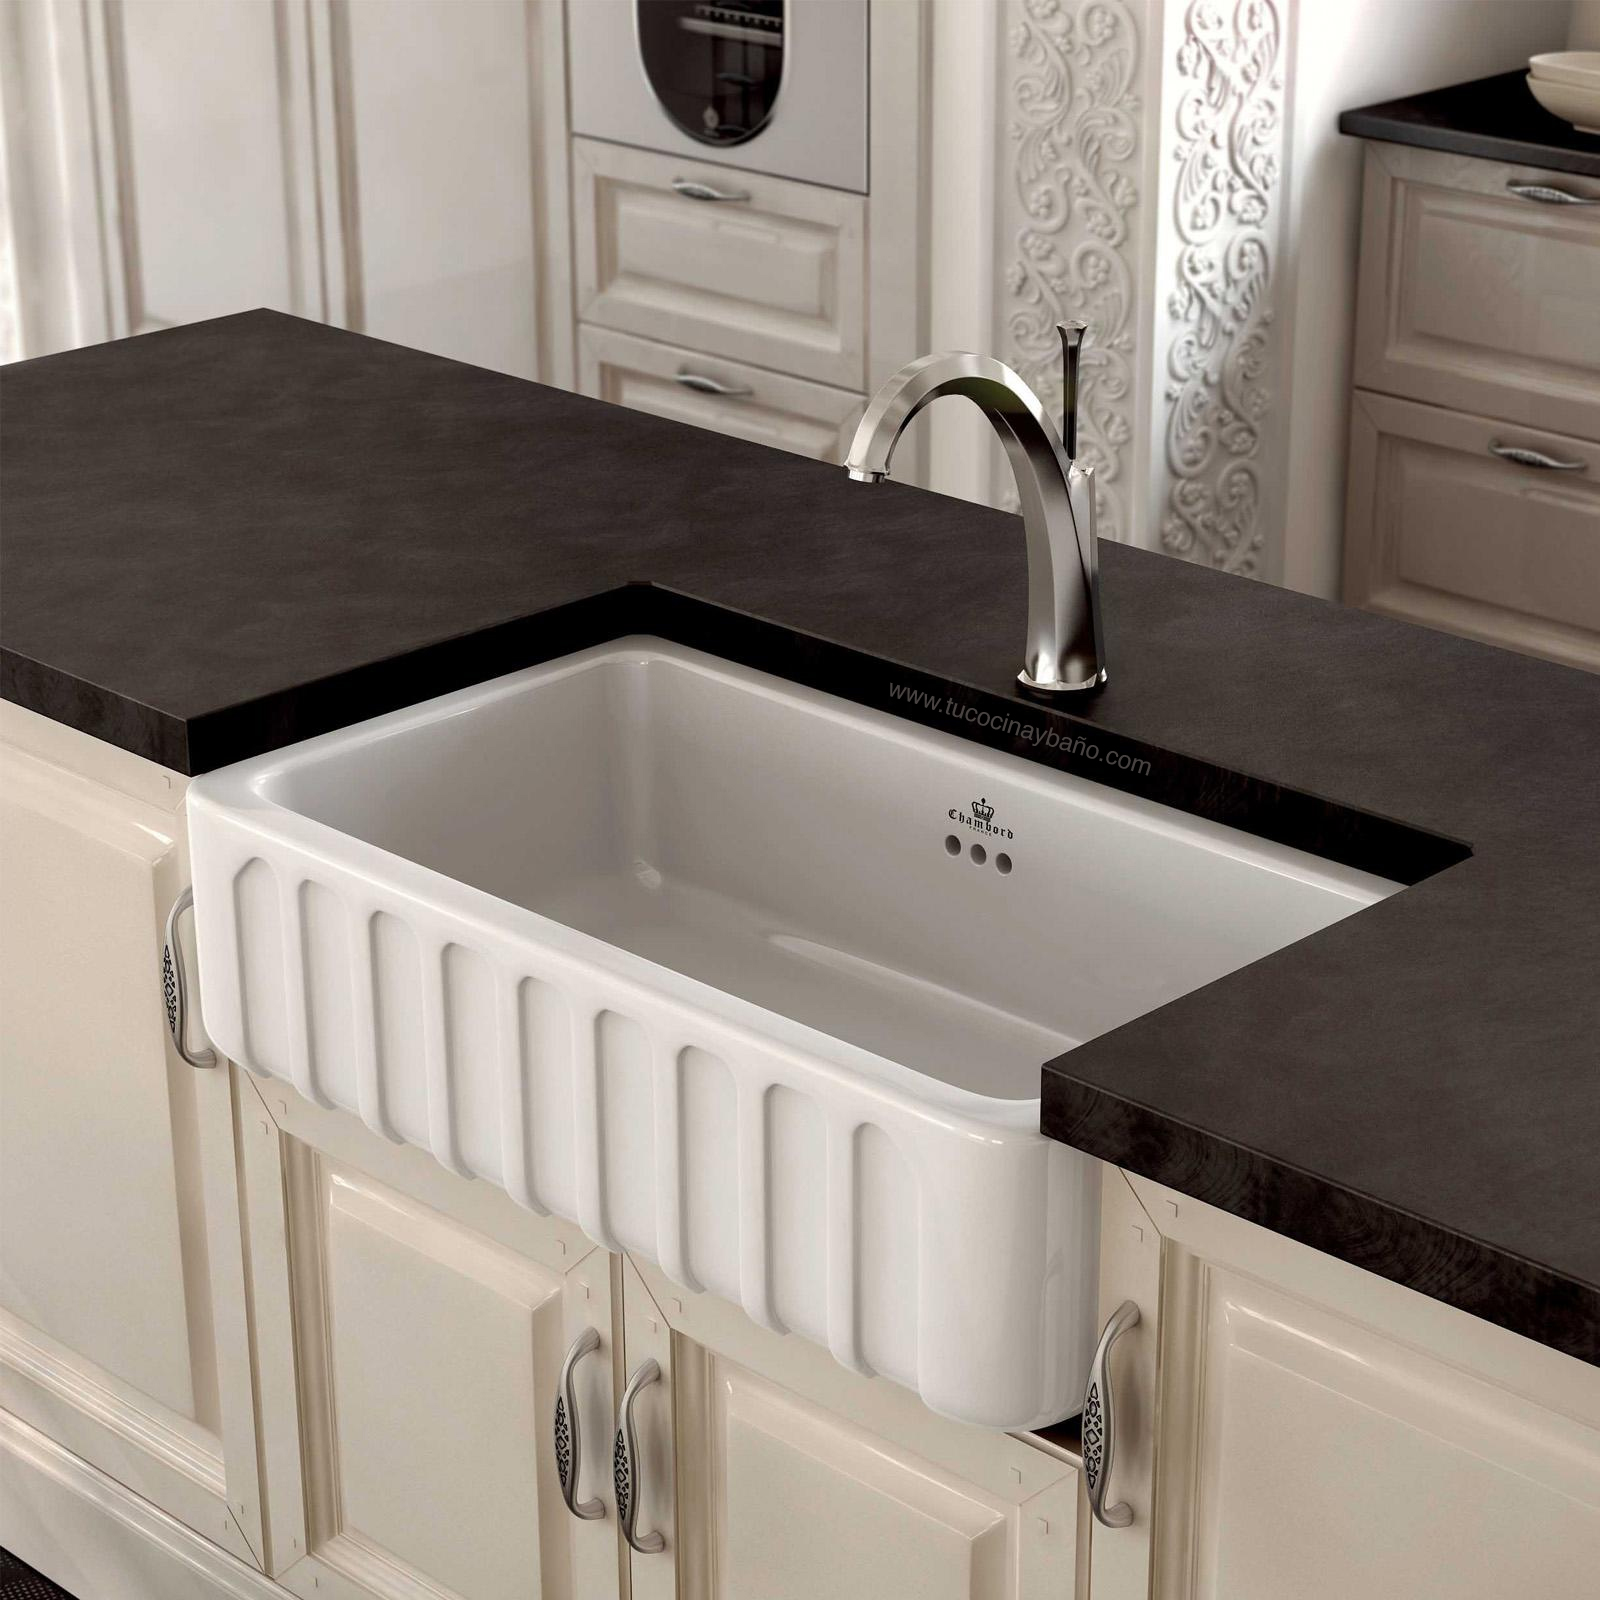 Fregadero ceramico luis segundo tu cocina y ba o for Fregadero precio